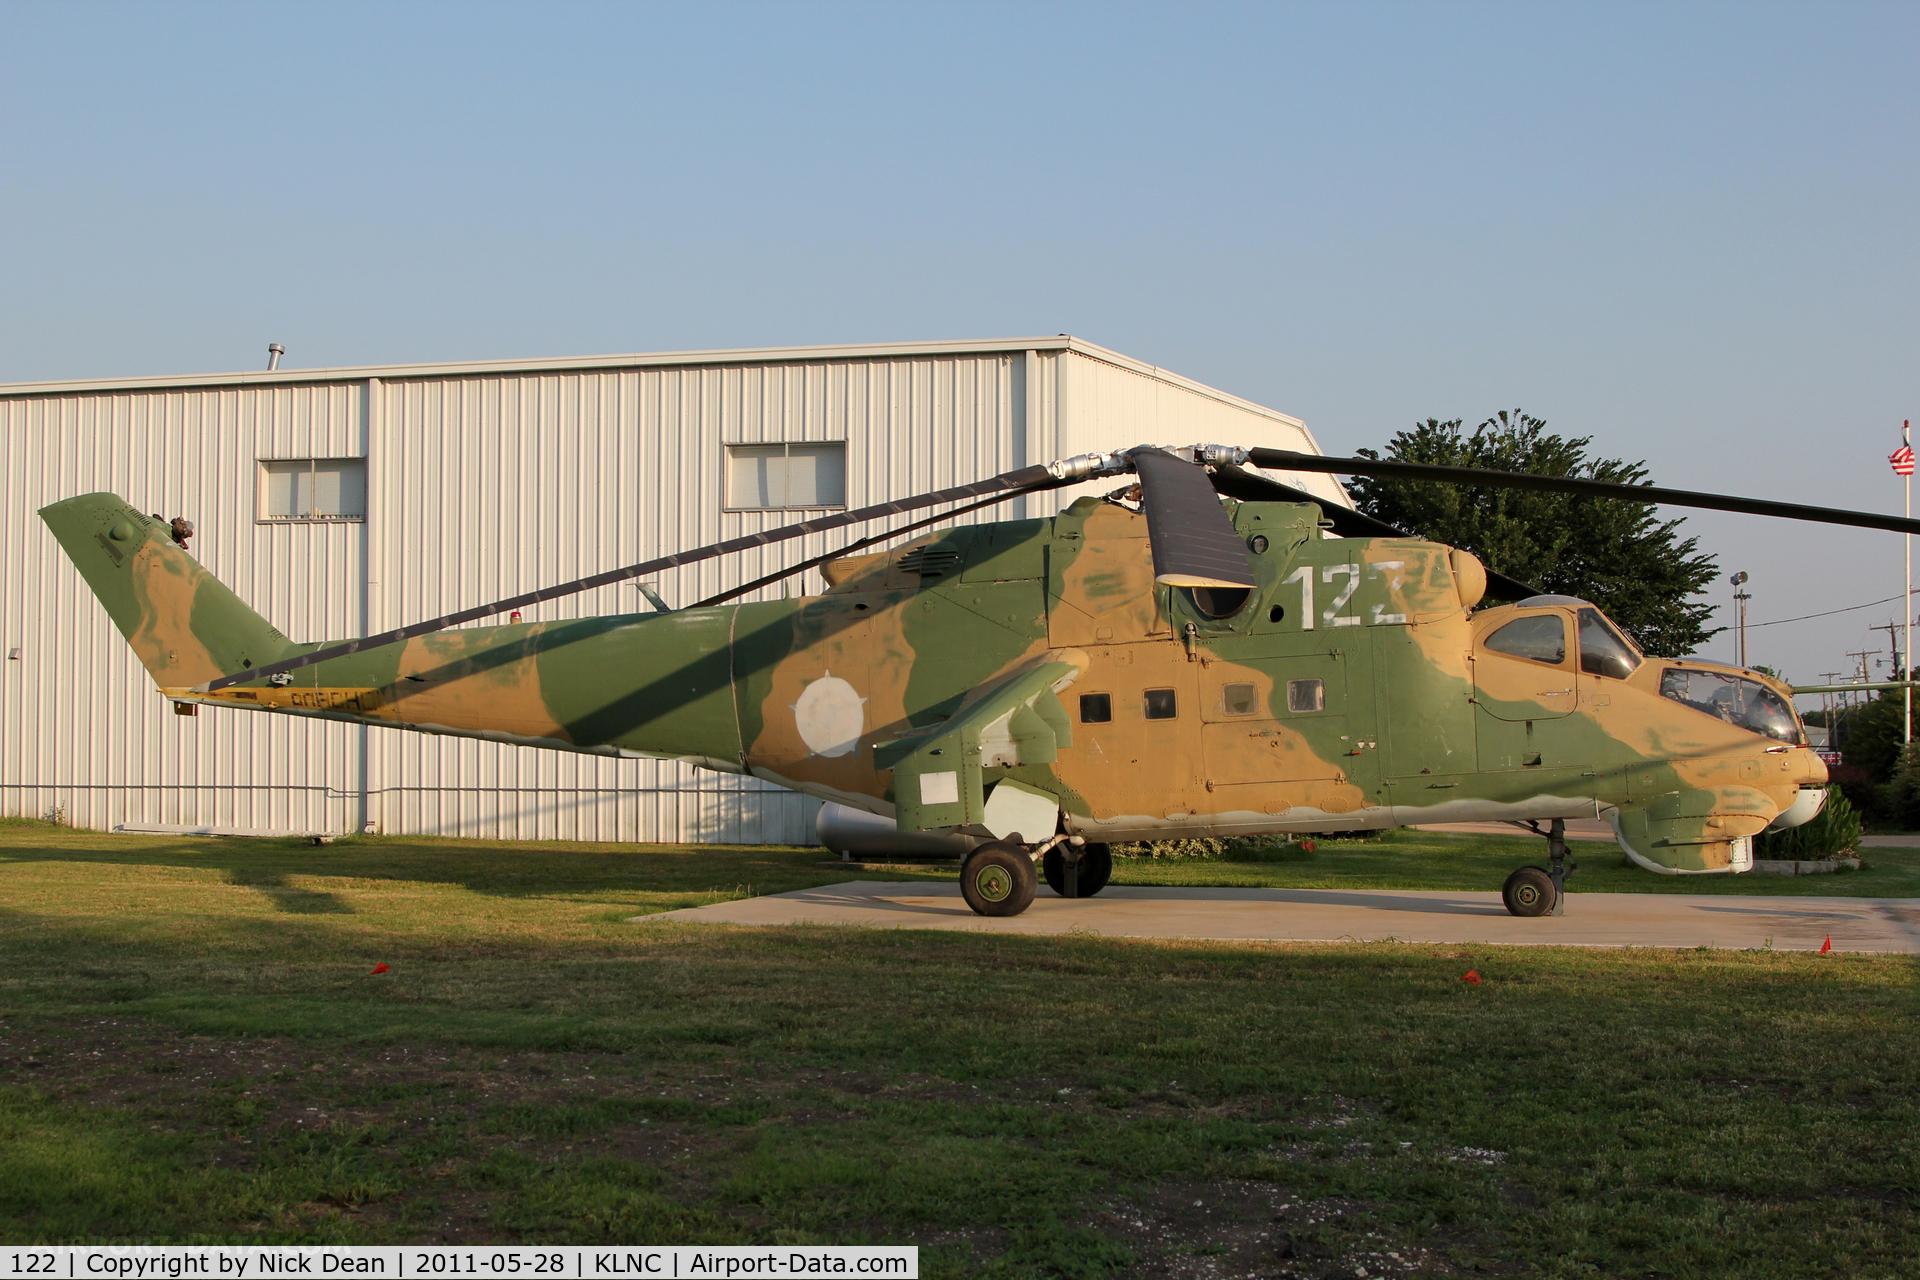 122, Mil Mi-24D Hind D C/N 730203, KLNC/LNC